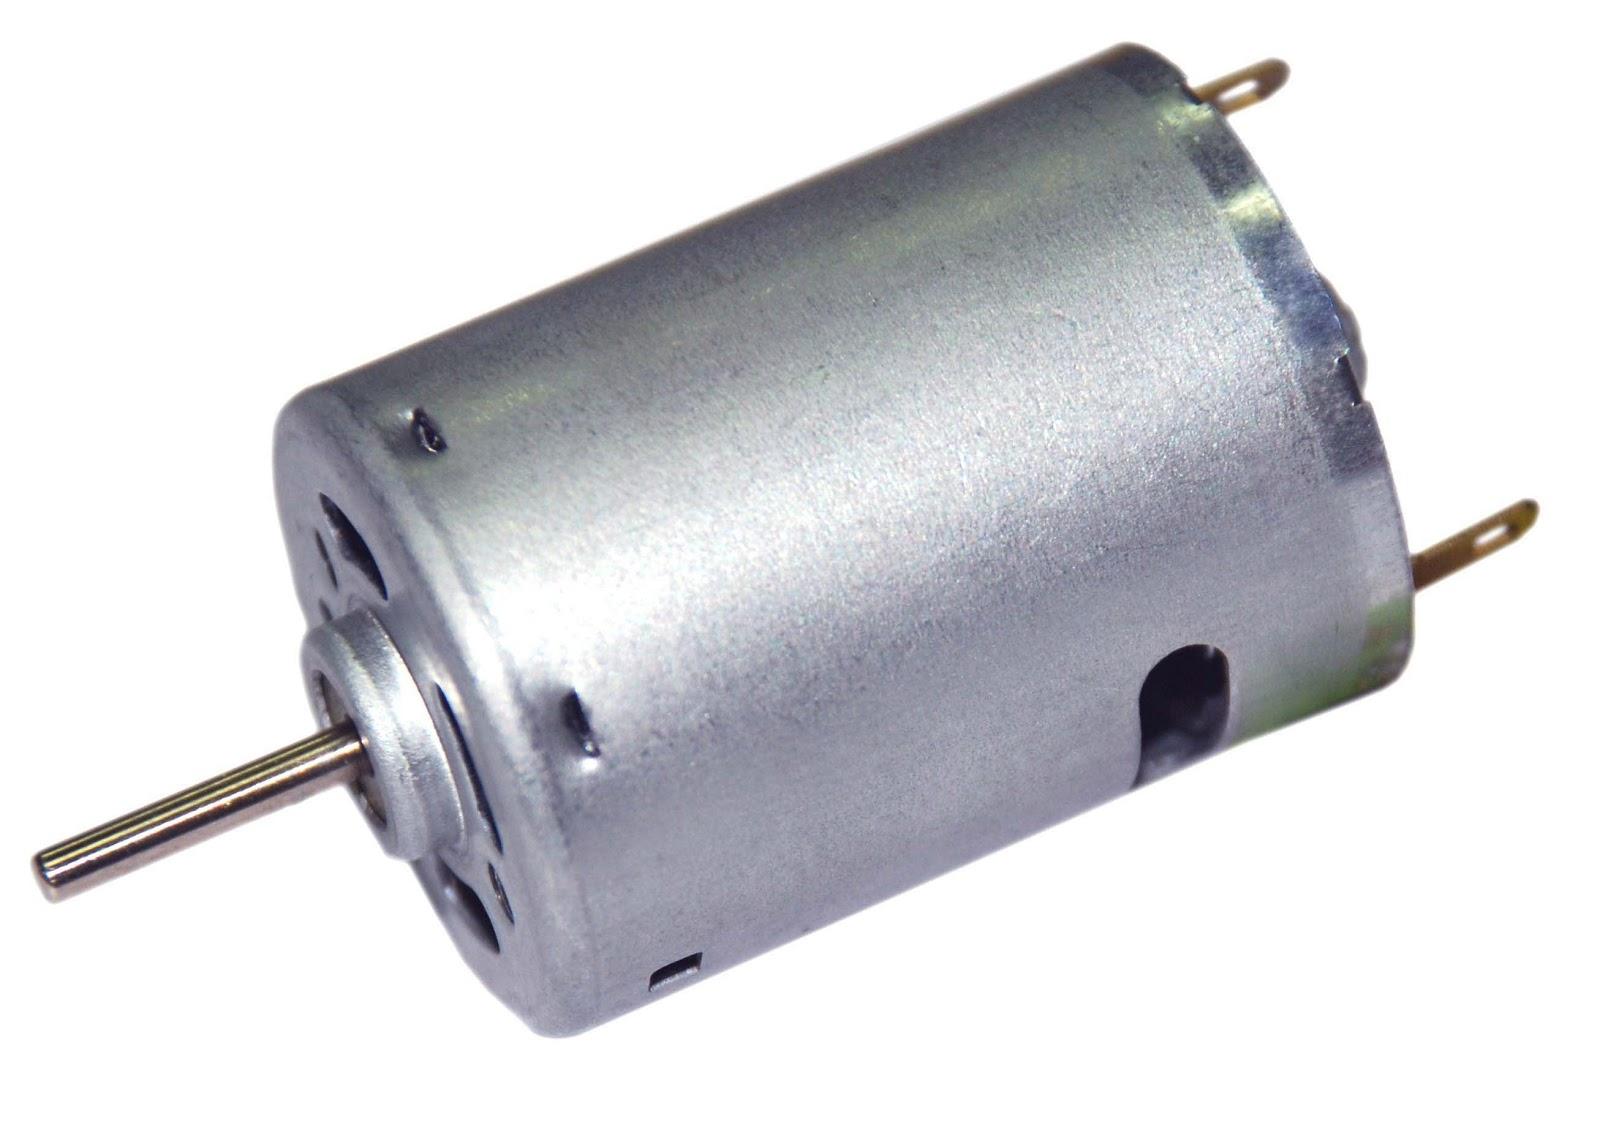 Brushed dc motor fundamentals